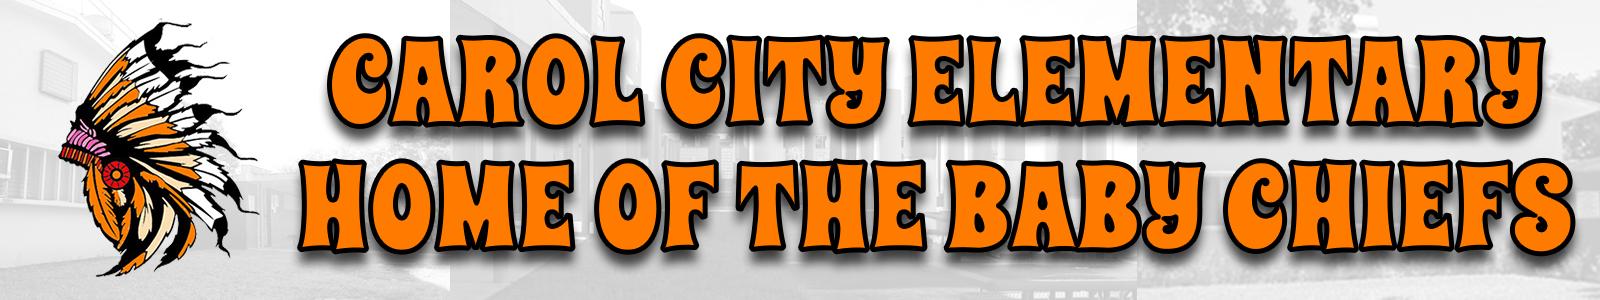 Carol City Elementary